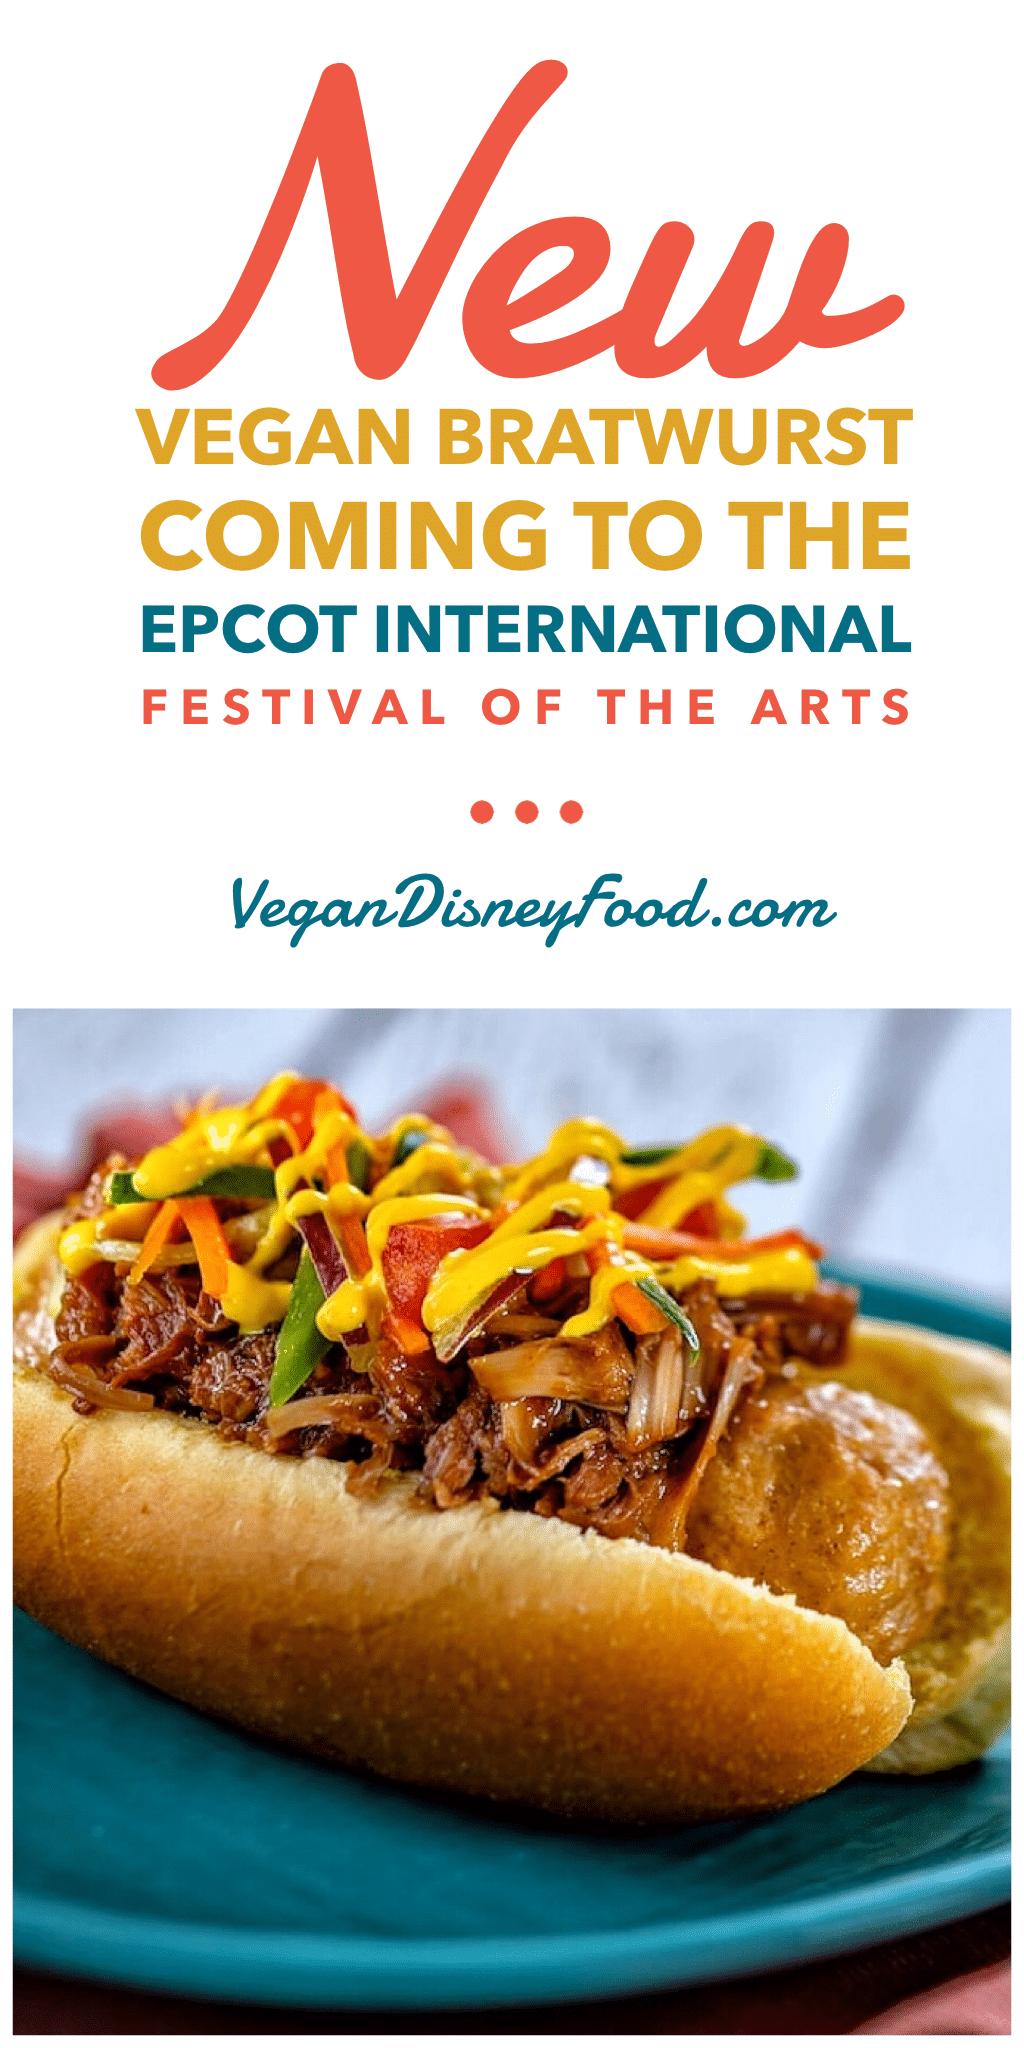 Vegan Bratwurst Coming to the 2020 Epcot International Festival of the Arts at Walt Disney World